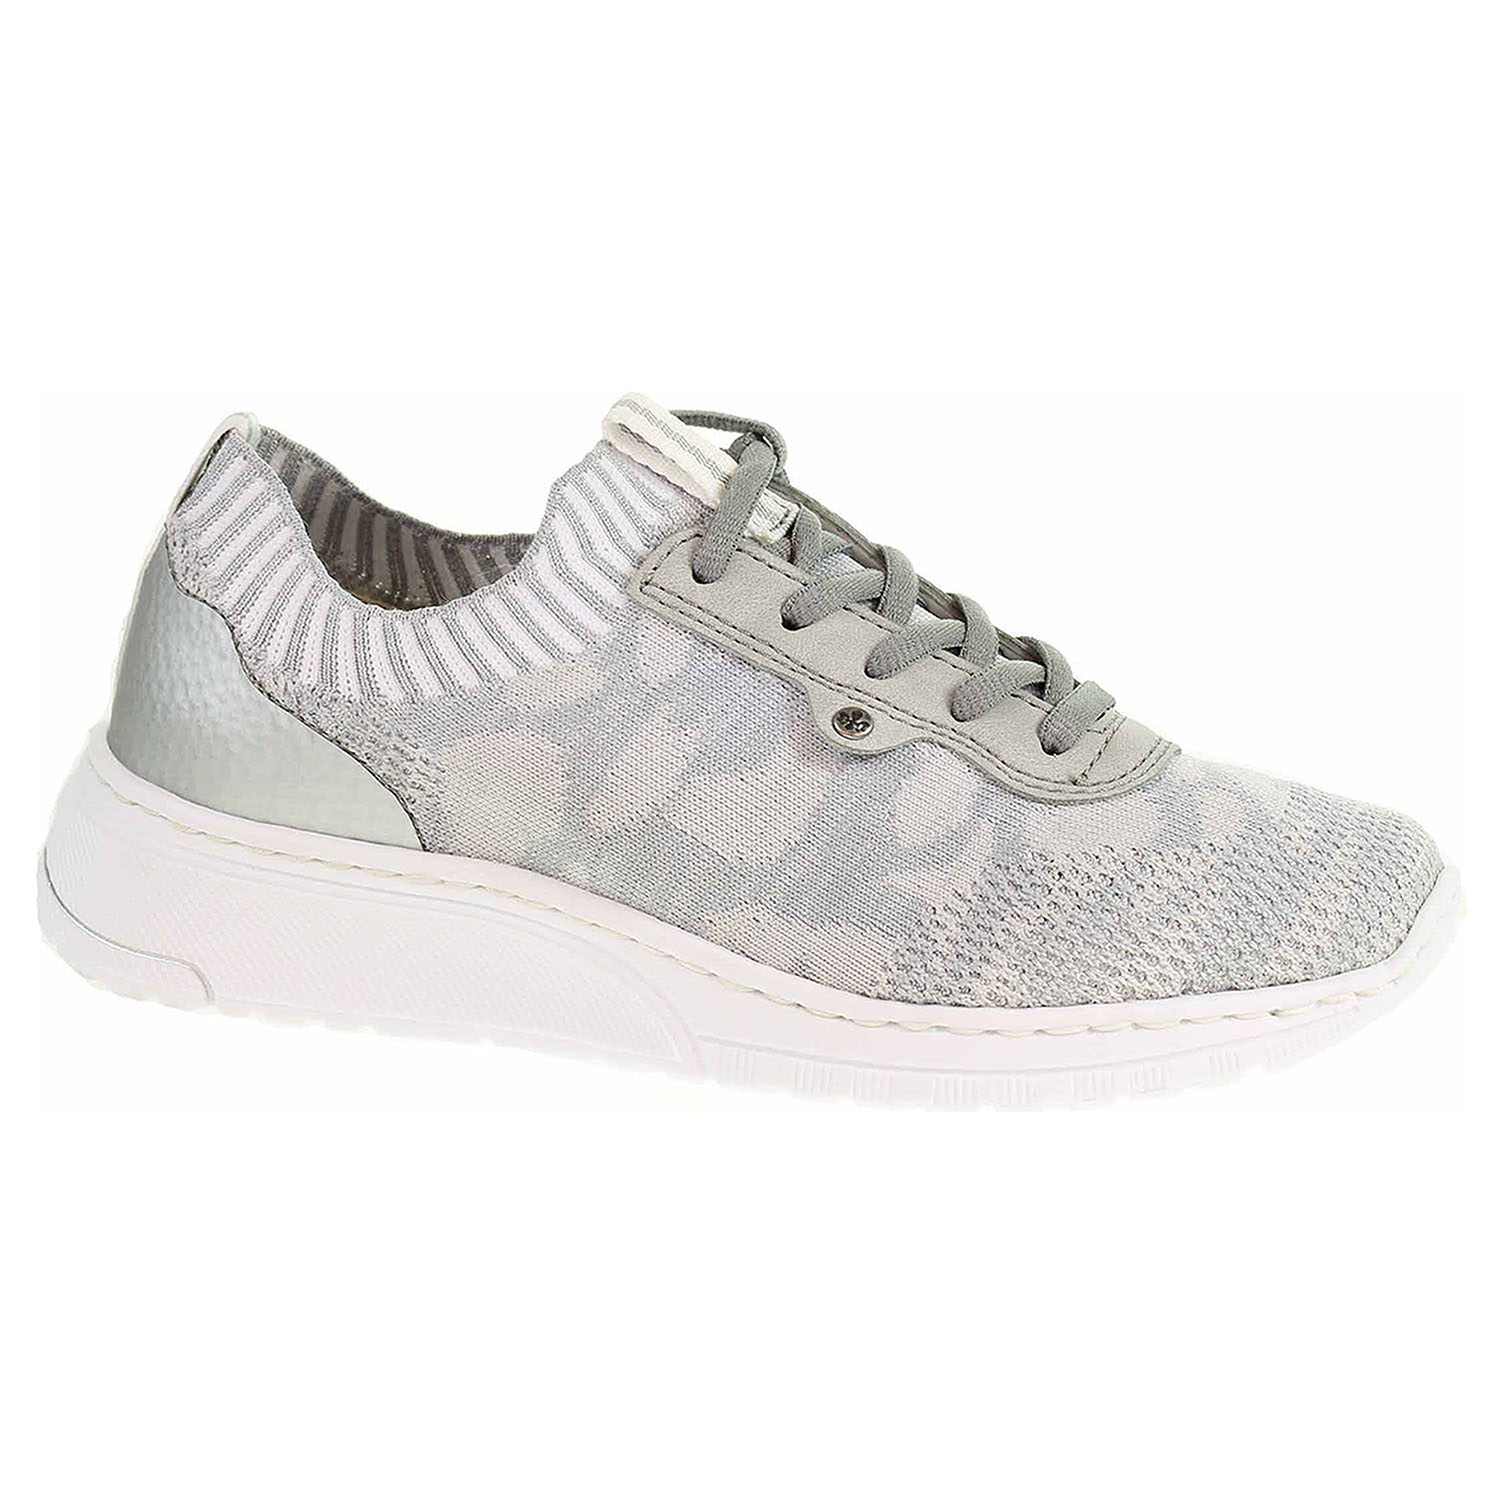 Dámská obuv Rieker N5059-42 grau N5059-42 37